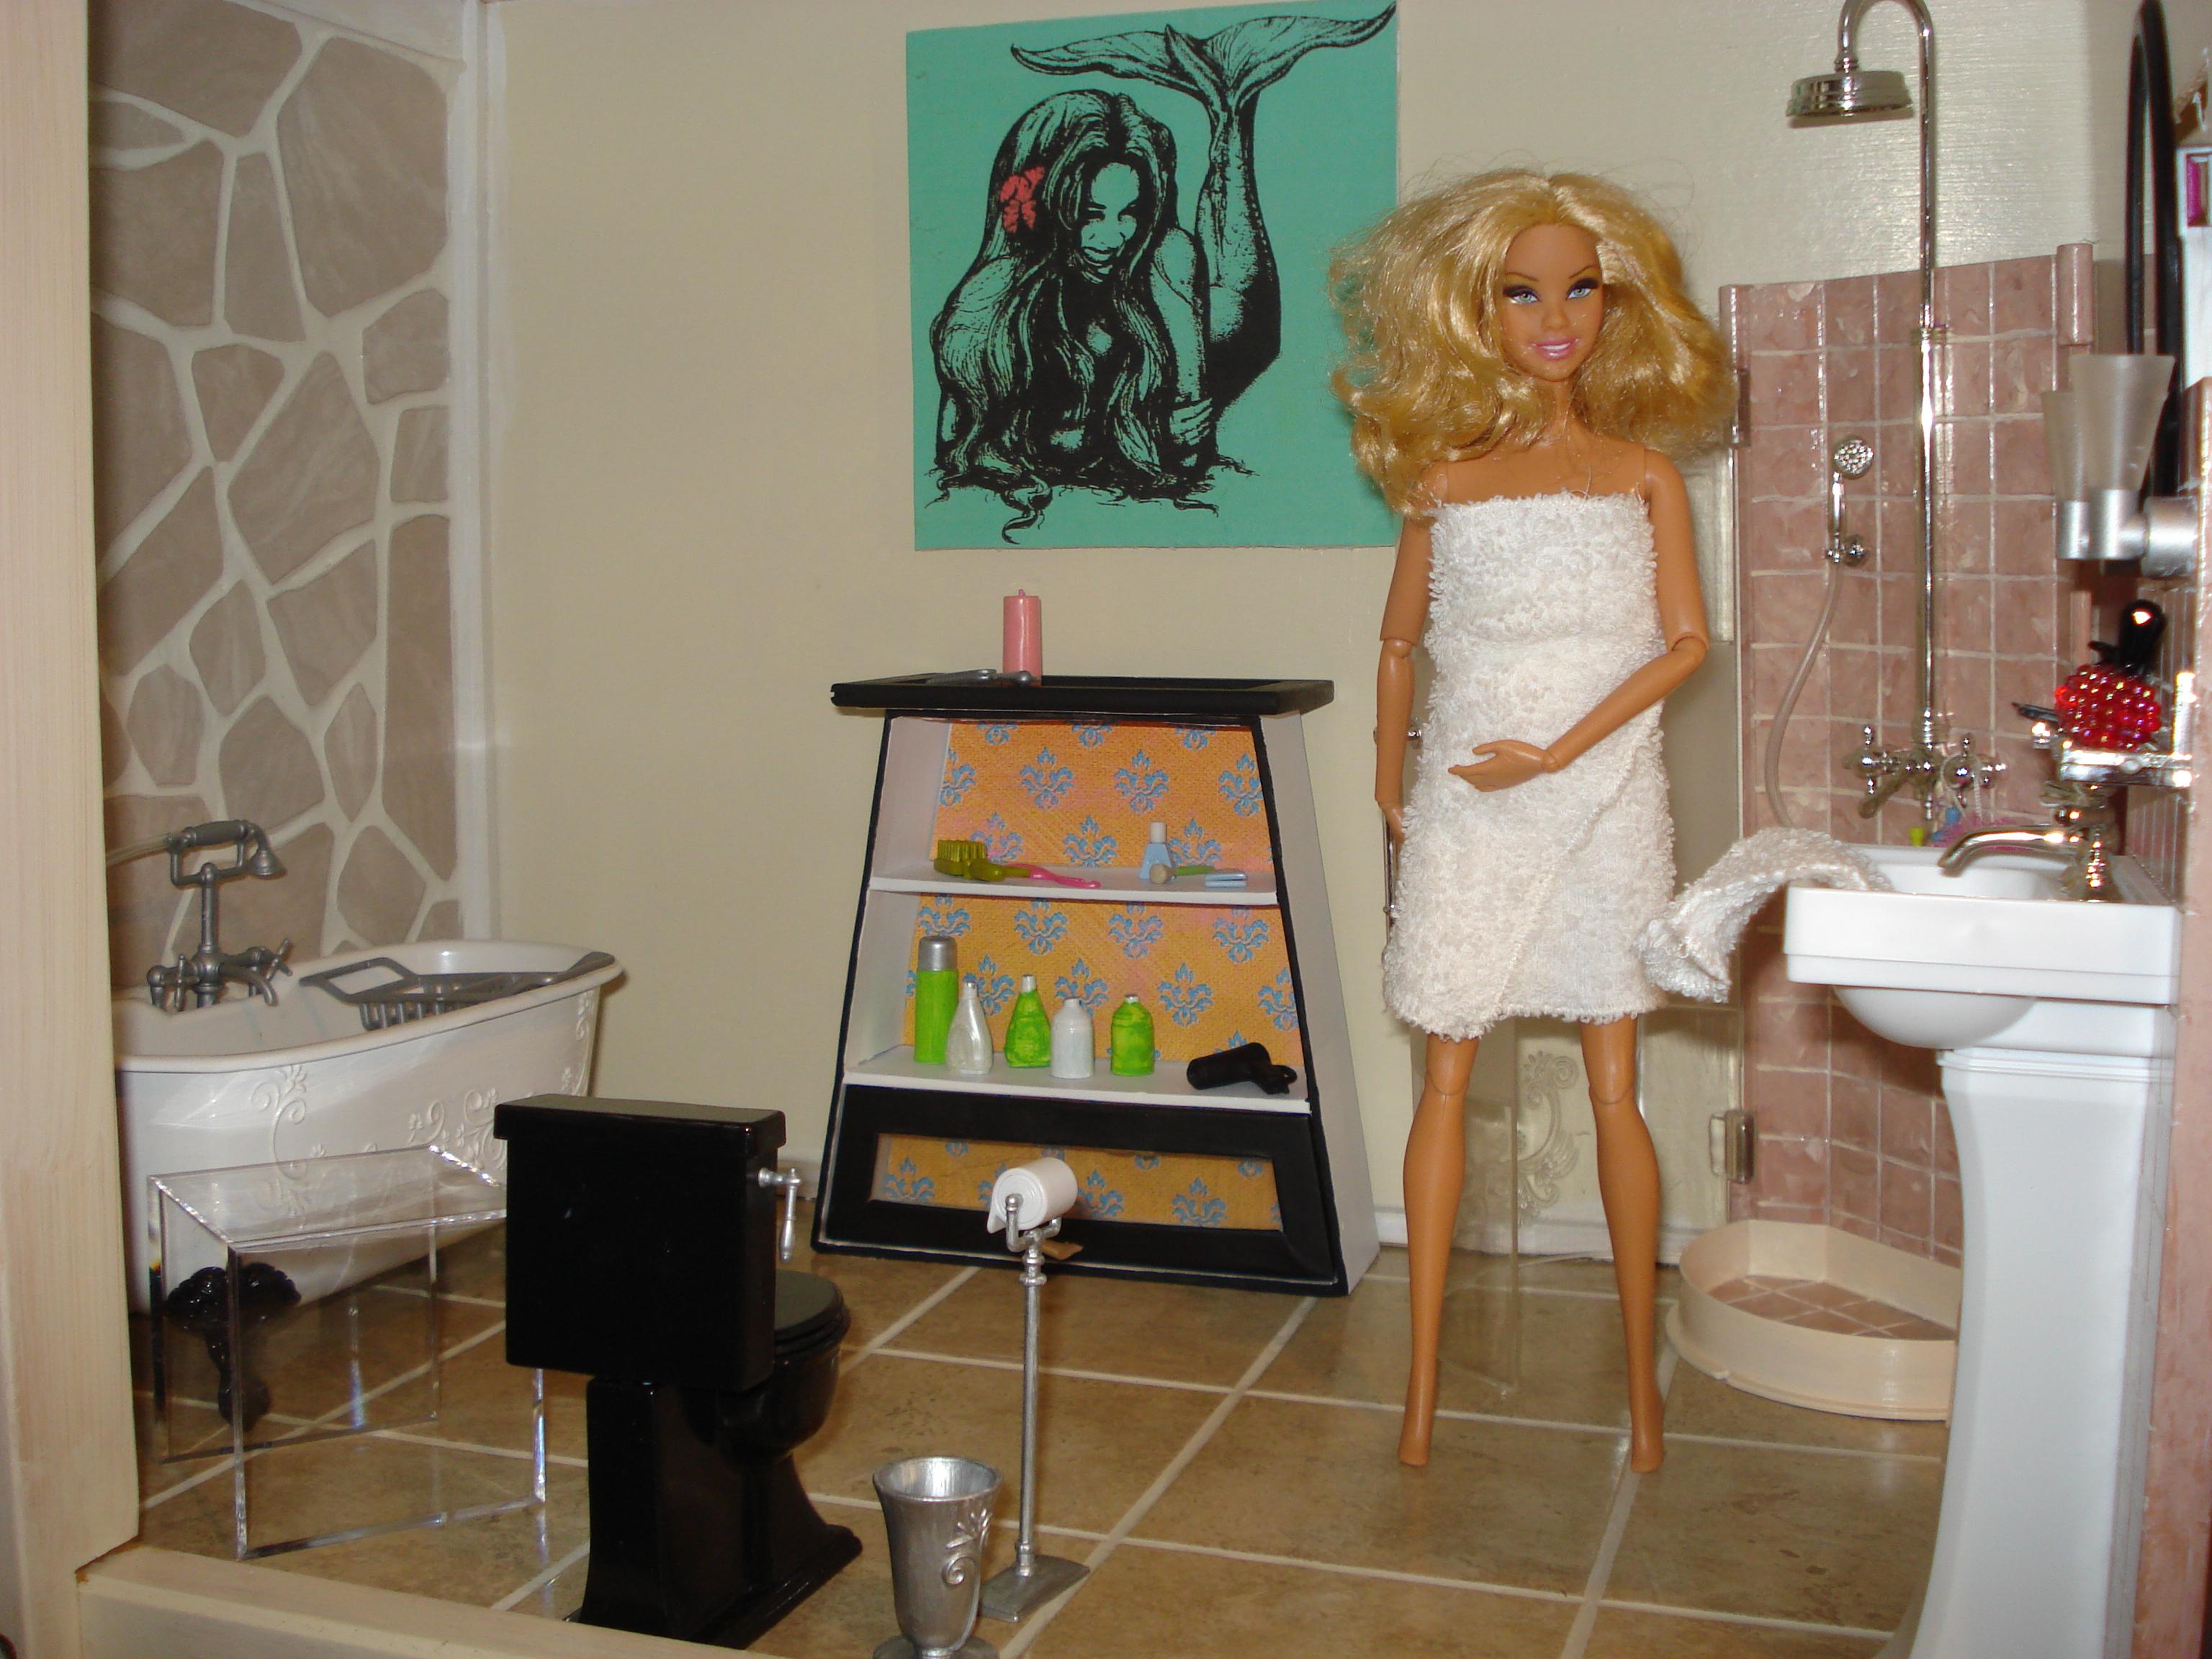 Wallpaper rock bathroom shower doll sink Barbie toilet